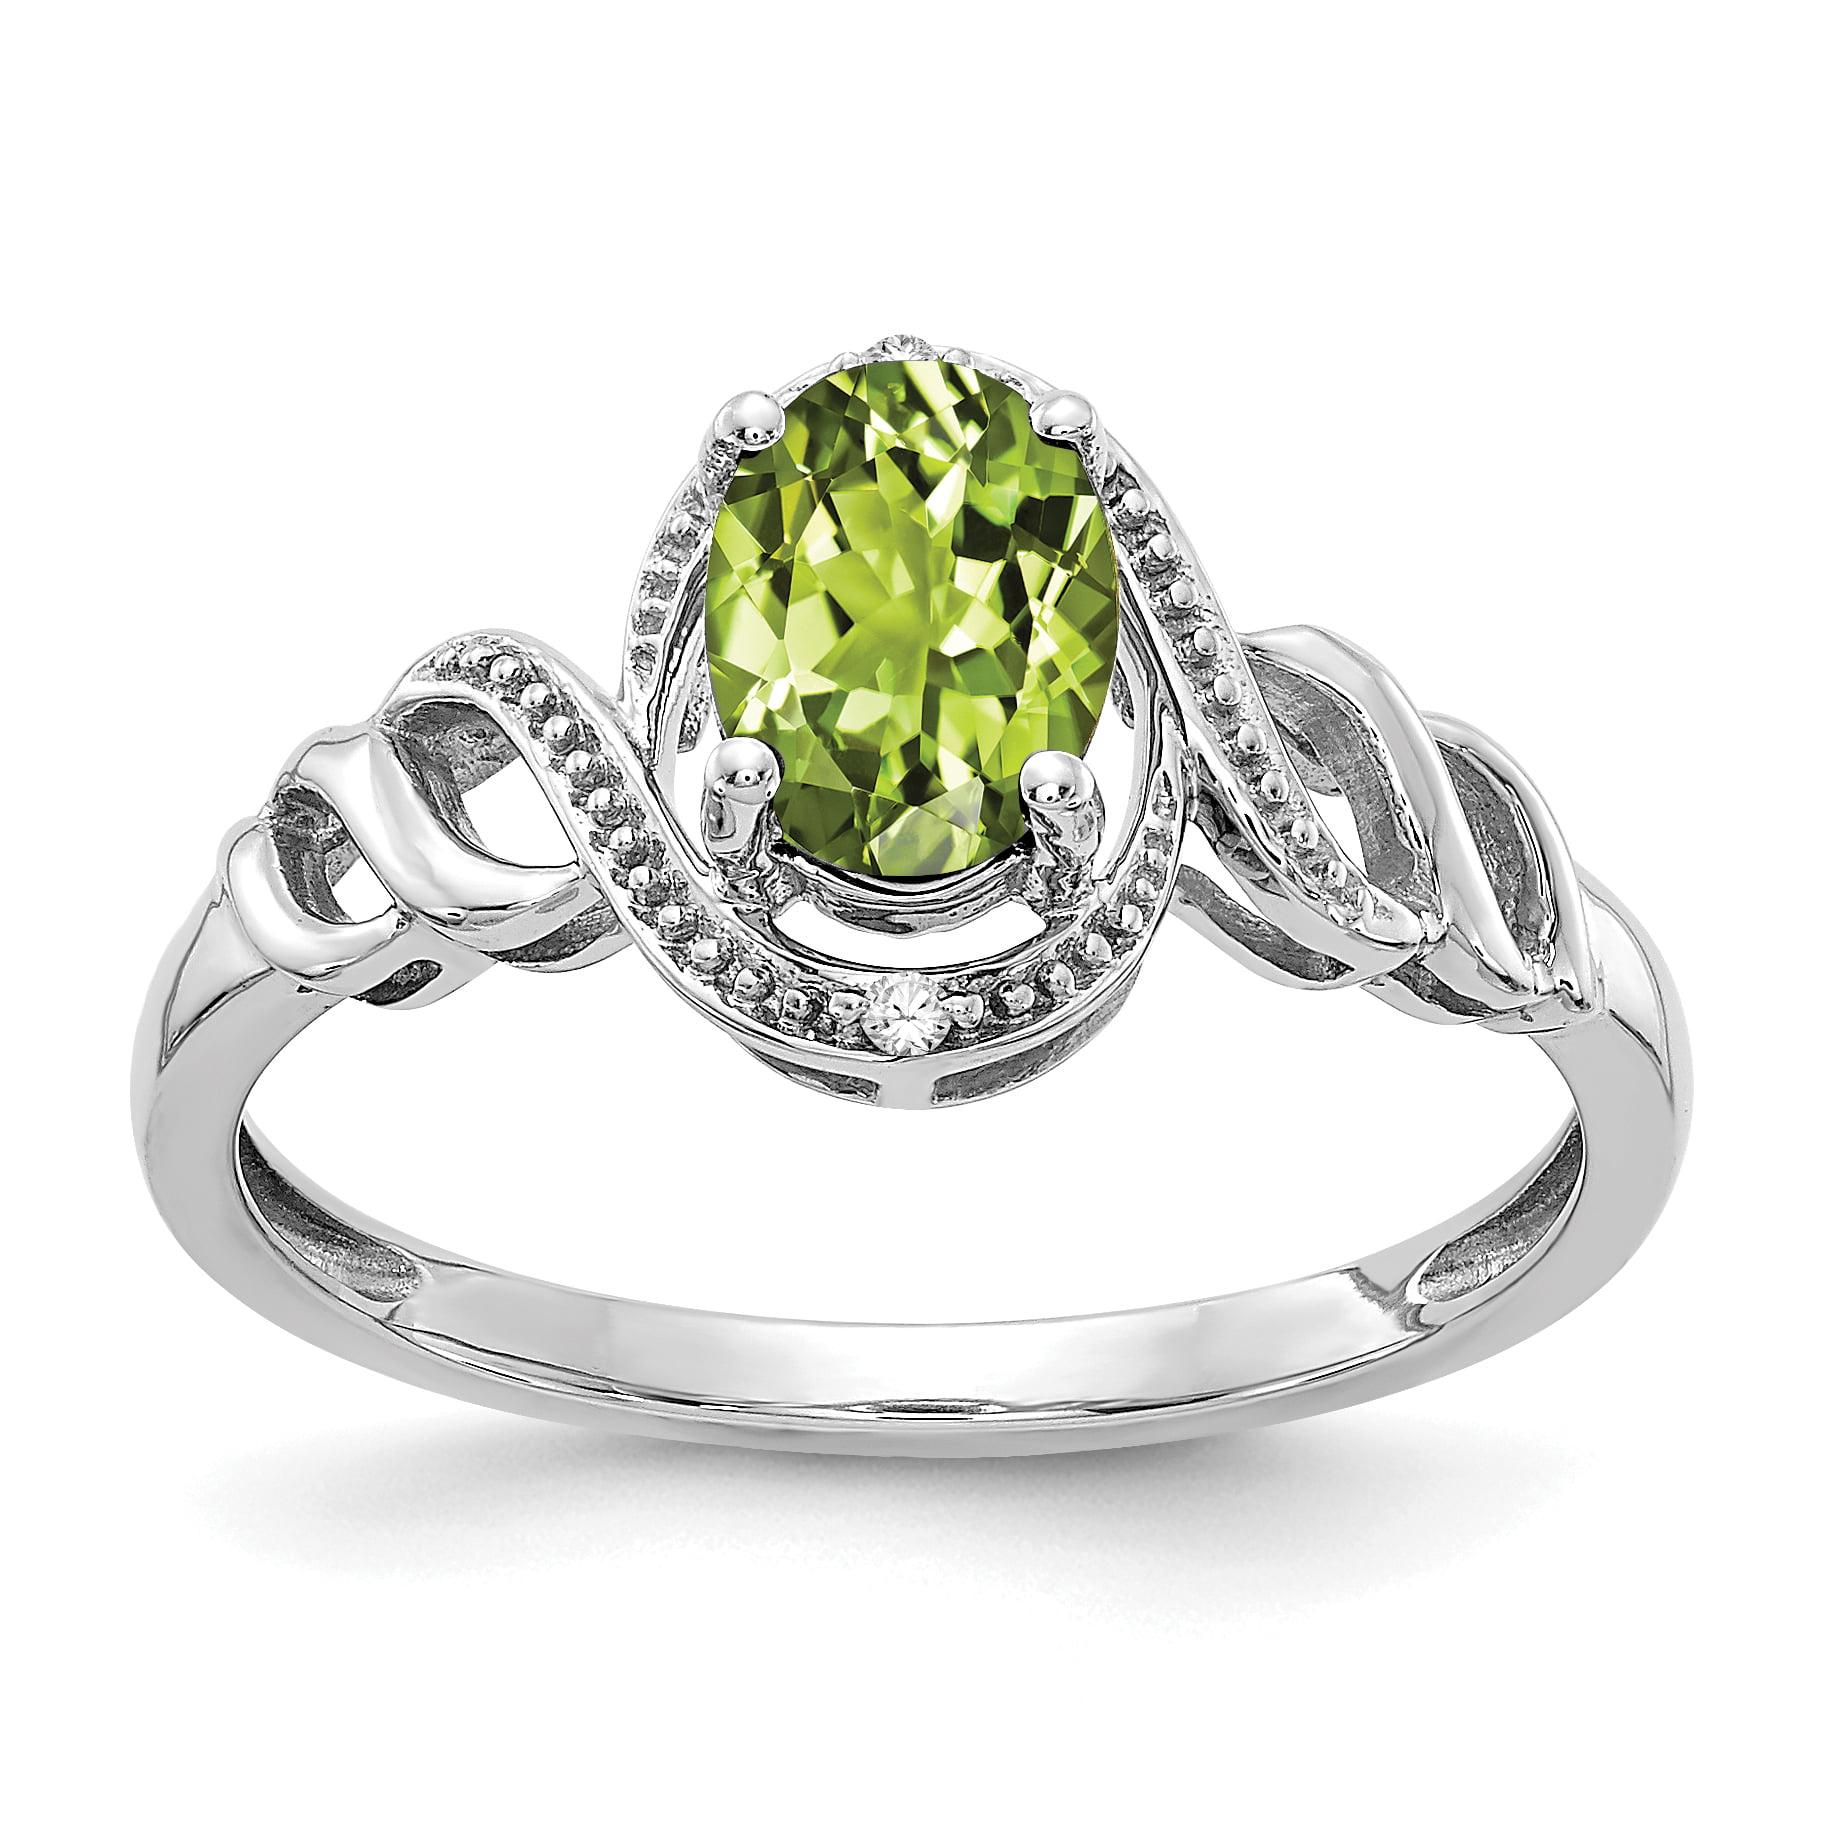 10k White Gold Peridot Diamond Ring by Saris and Things QG